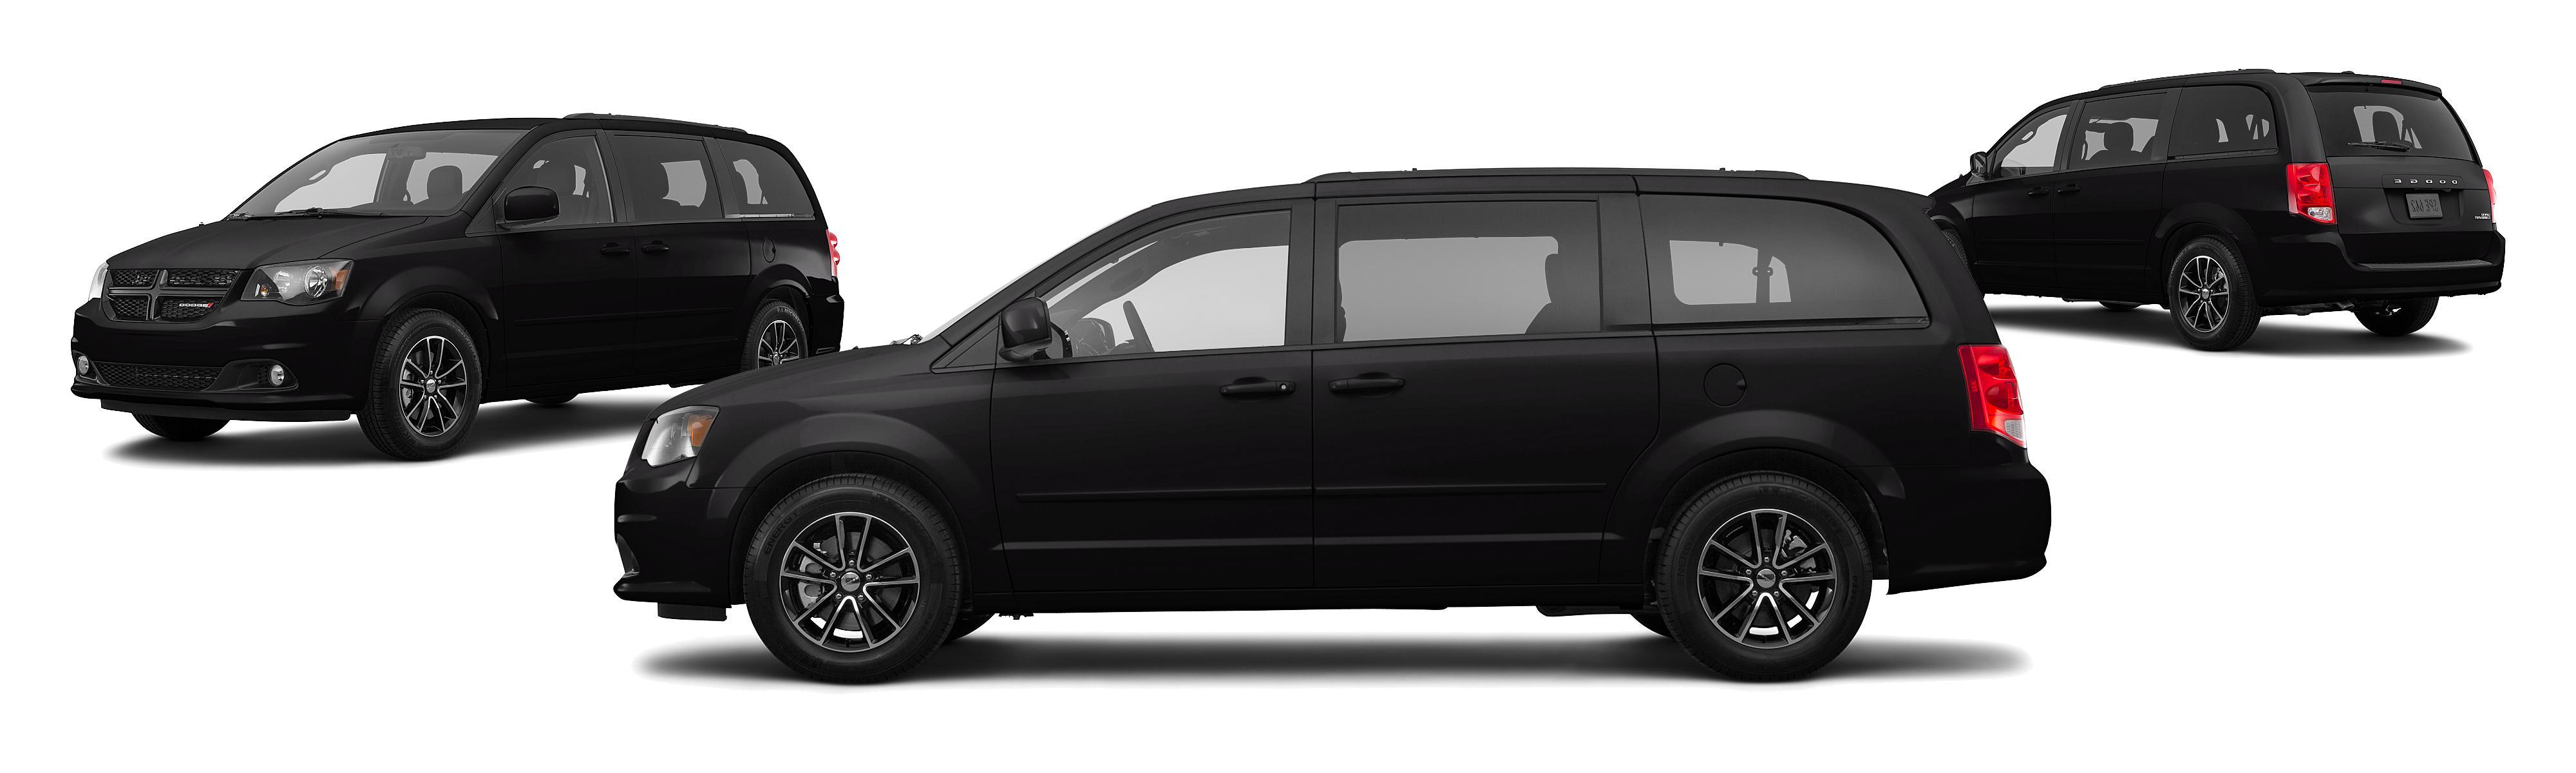 2017 Dodge Grand Caravan SXT 4dr MiniVan  Research  GrooveCar